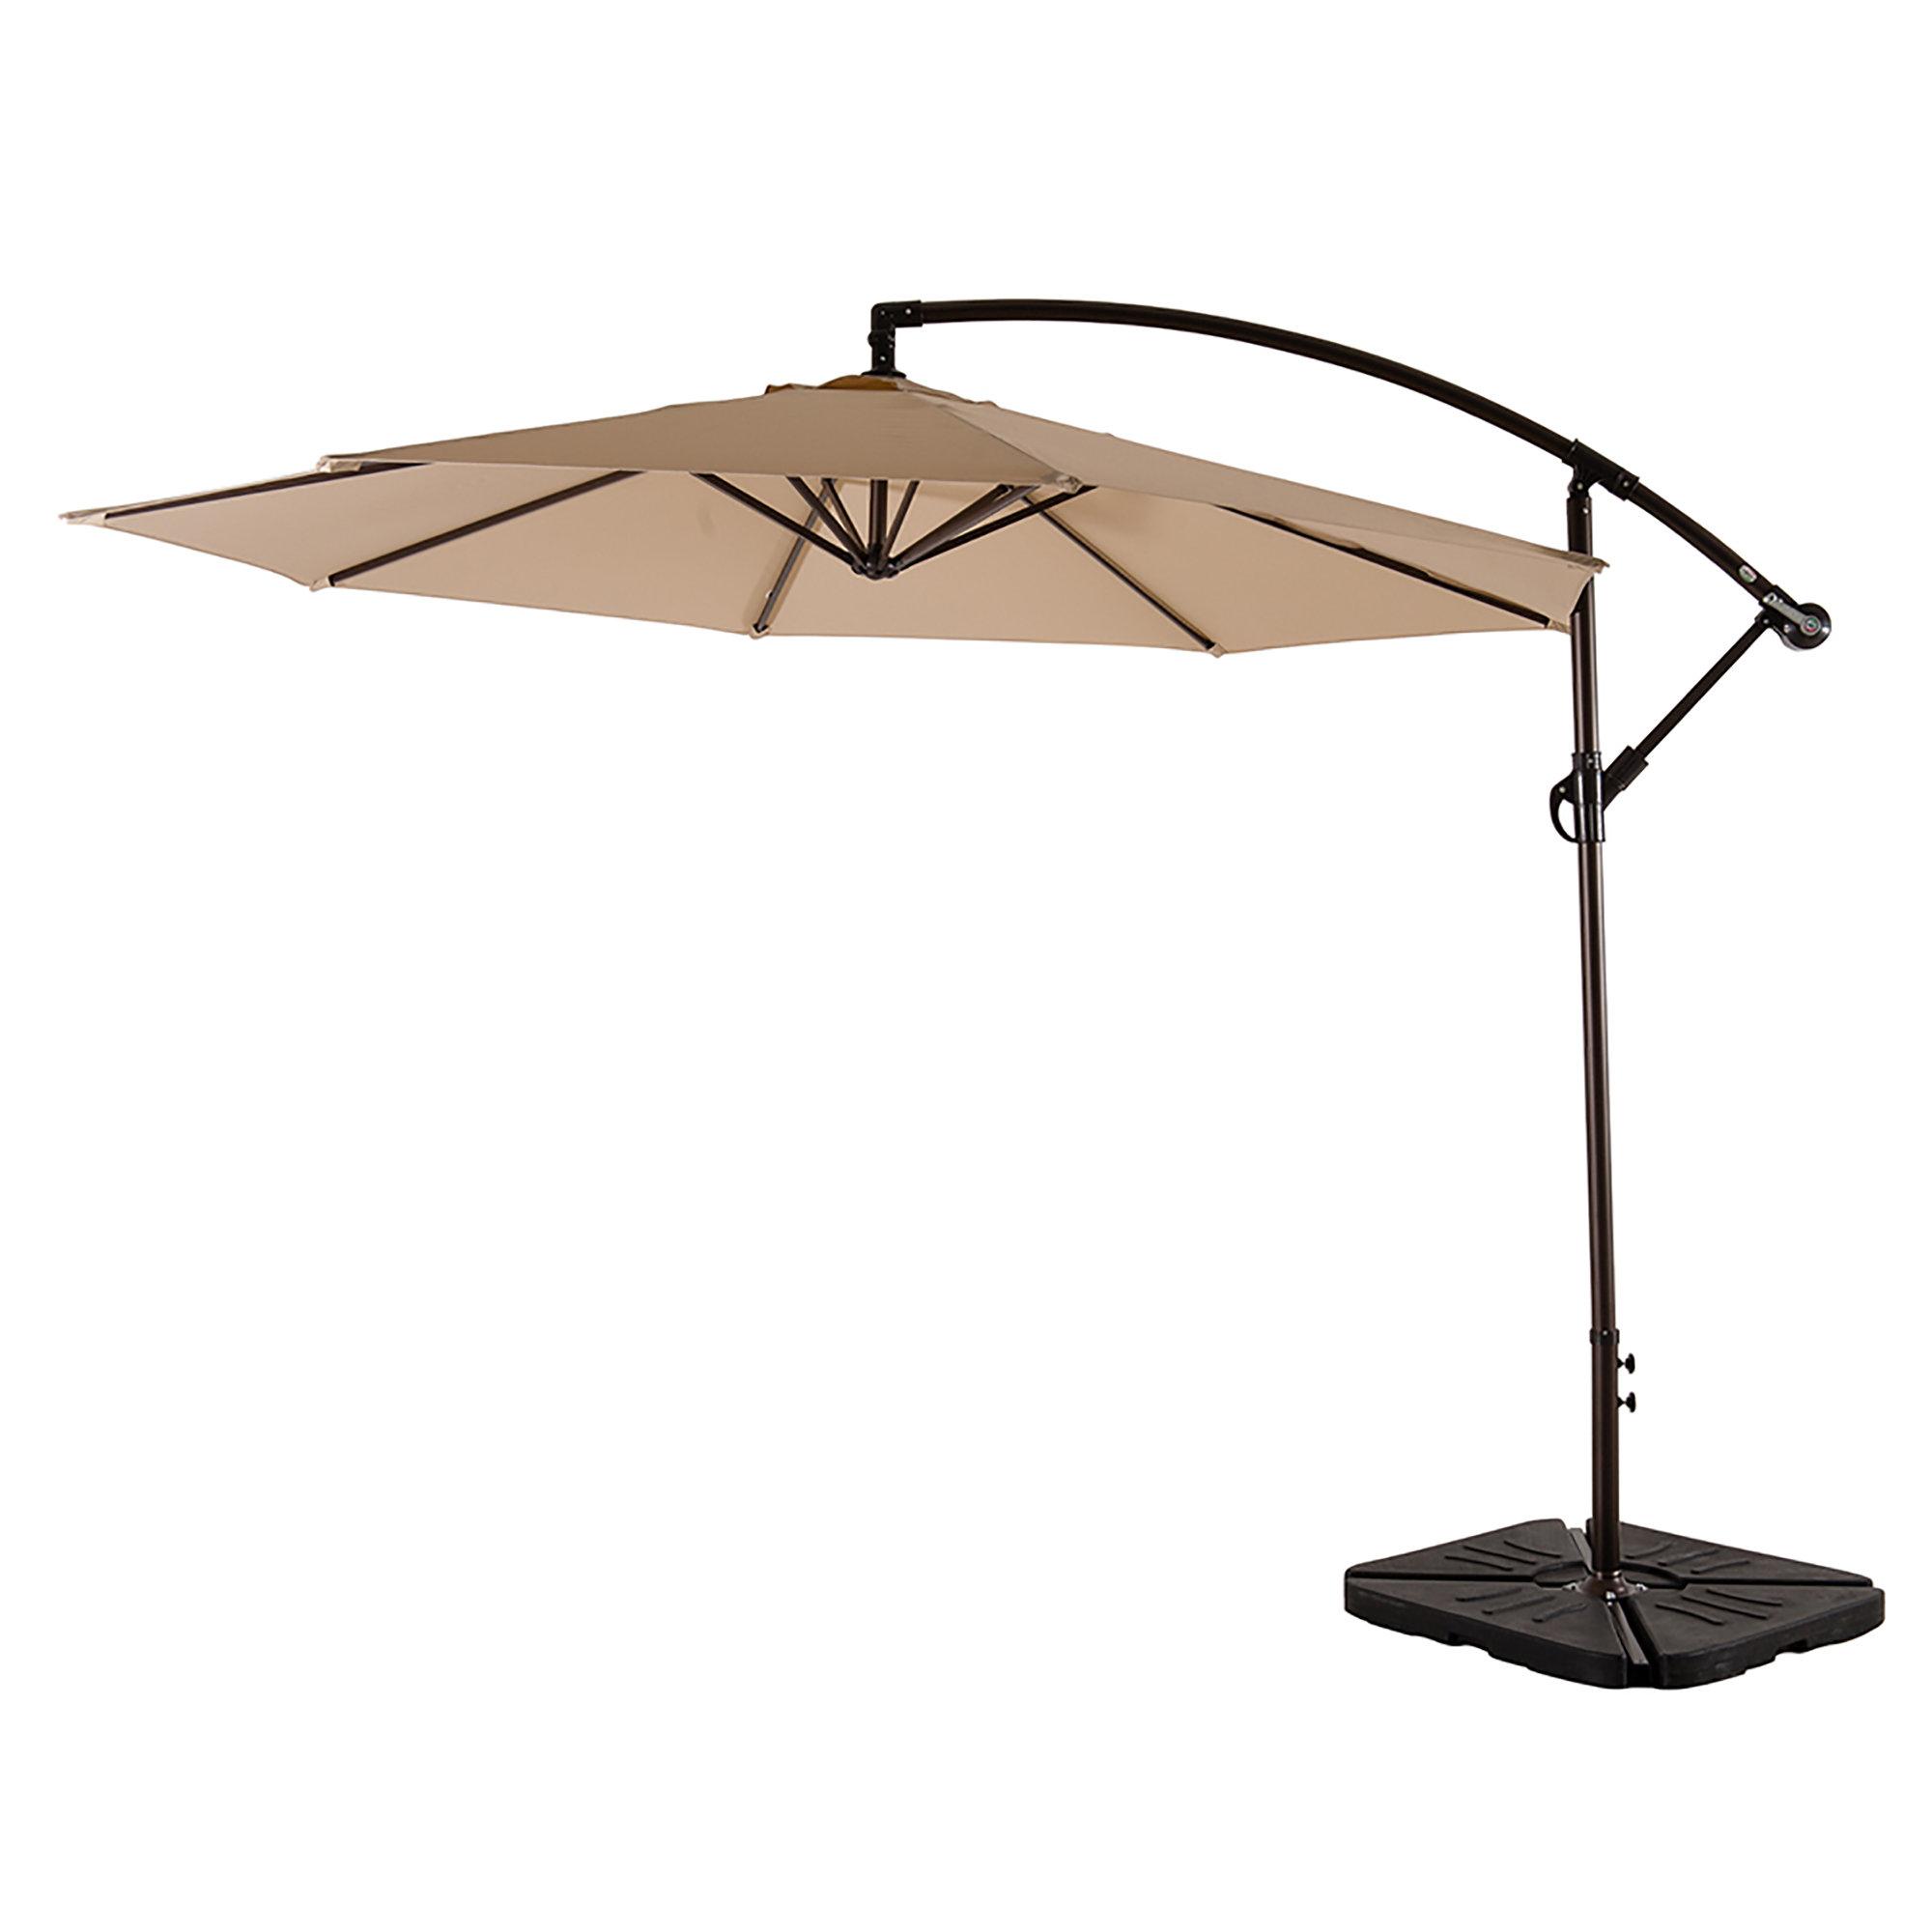 Ryant Cantilever Umbrellas For Preferred Kizzie Market 10' Cantilever Umbrella (View 7 of 20)